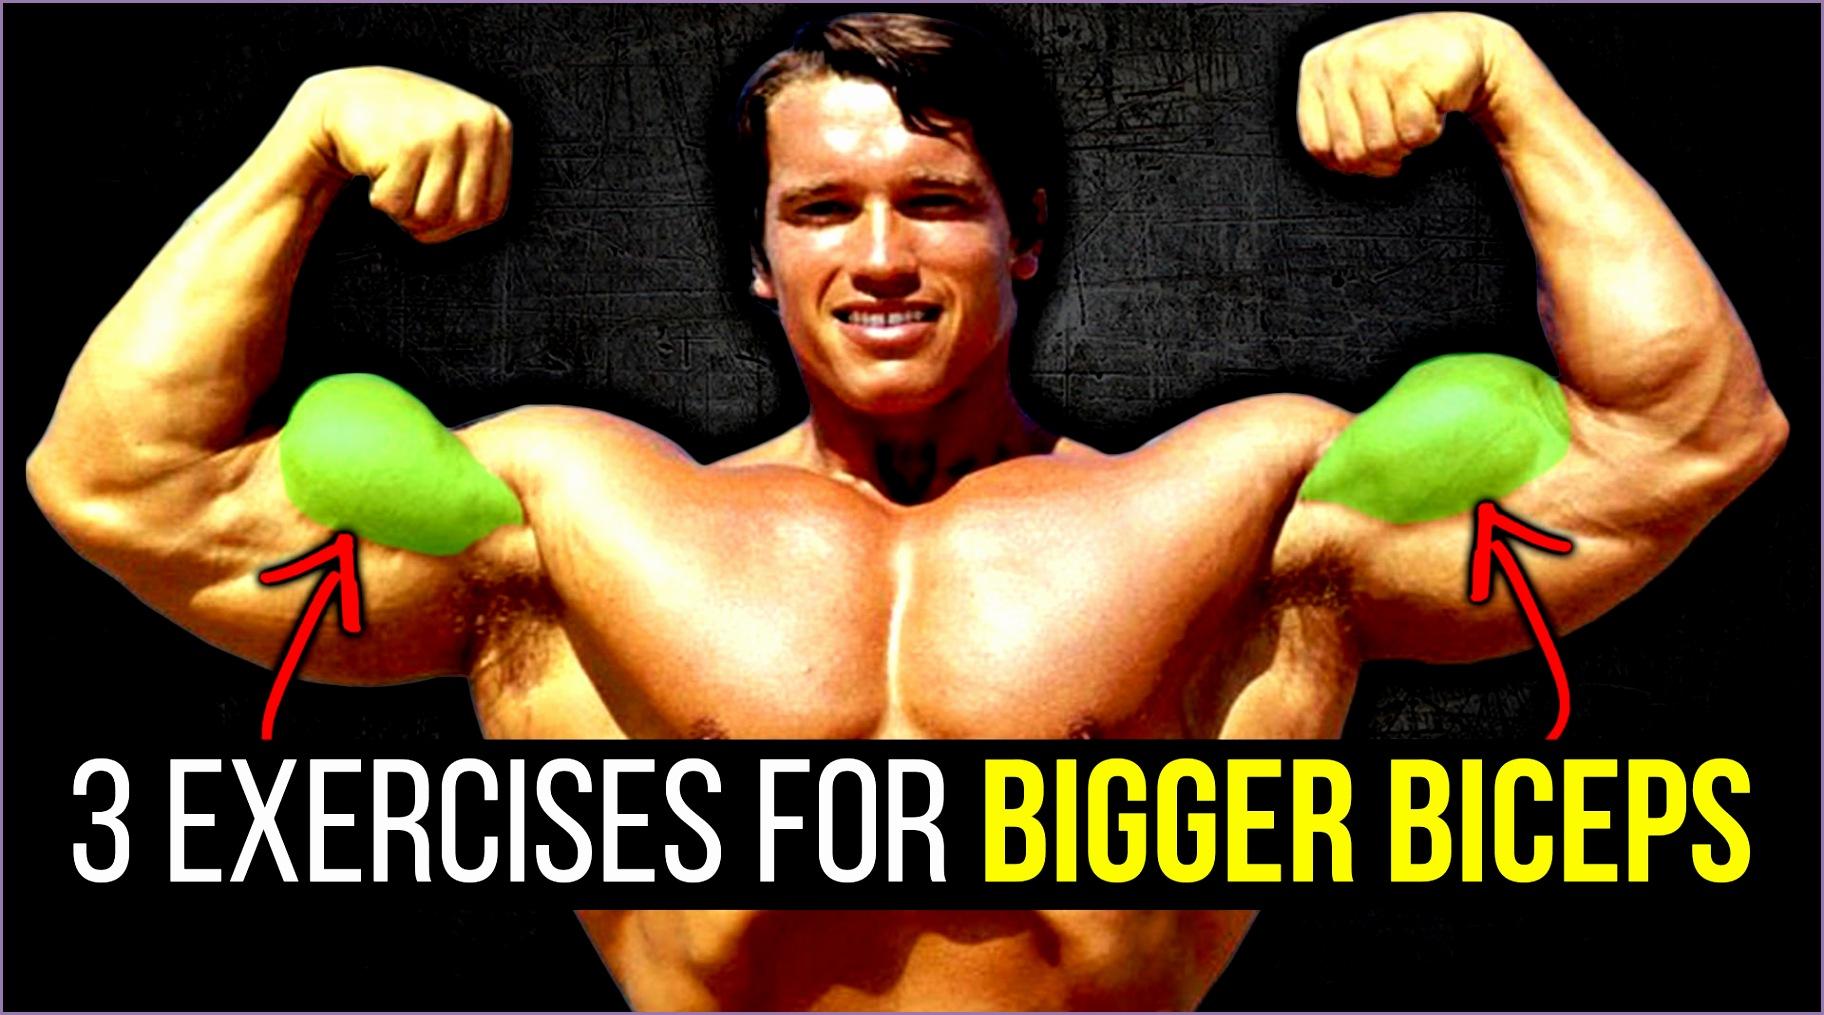 bigger biceps guaranteed killer workout for bigger biceps